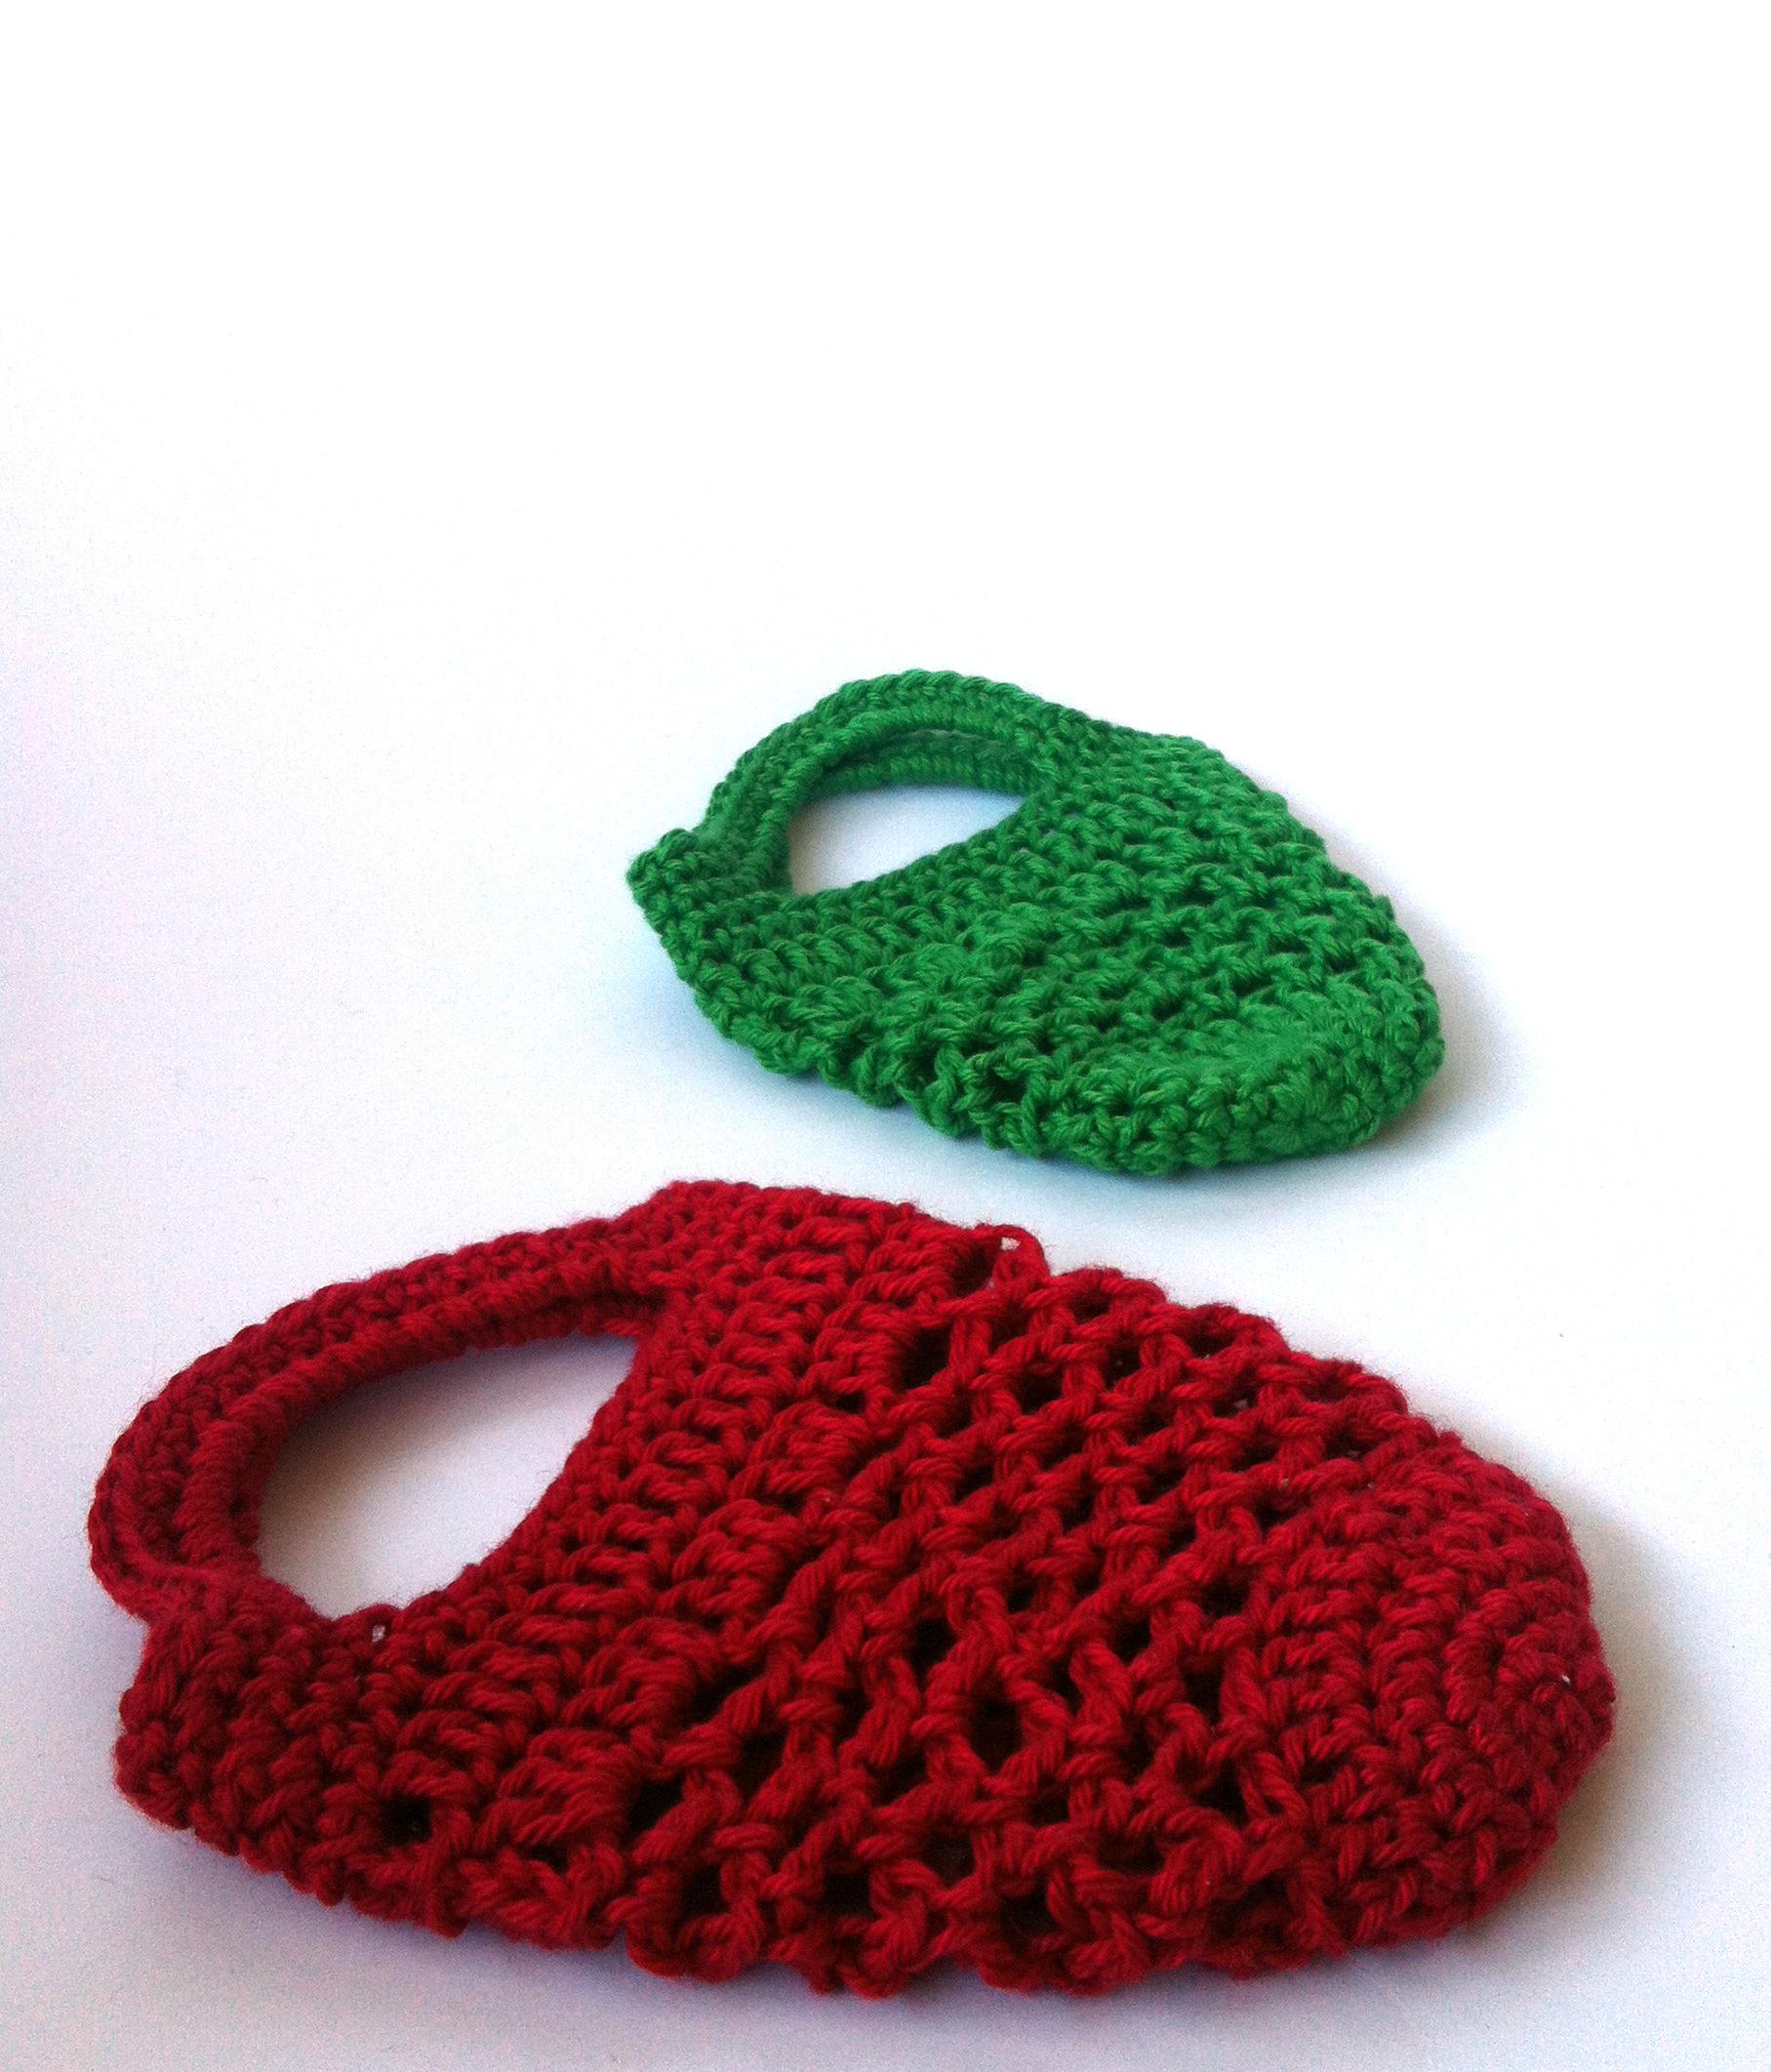 Mini crochet gift bag free pattern spincushions flat bags bankloansurffo Gallery